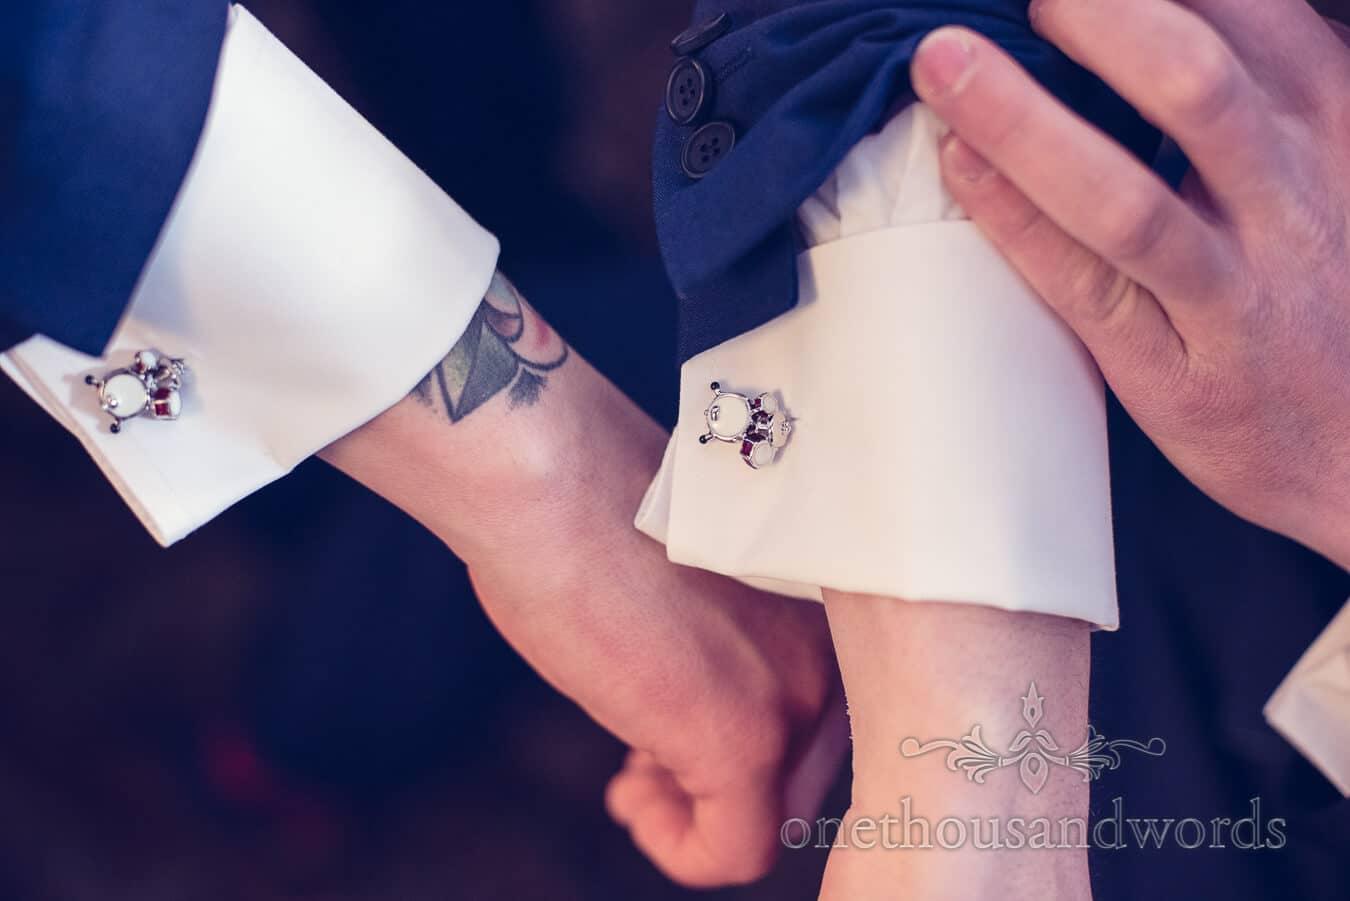 Drum cuff links detail from Purbeck Golf Club Wedding